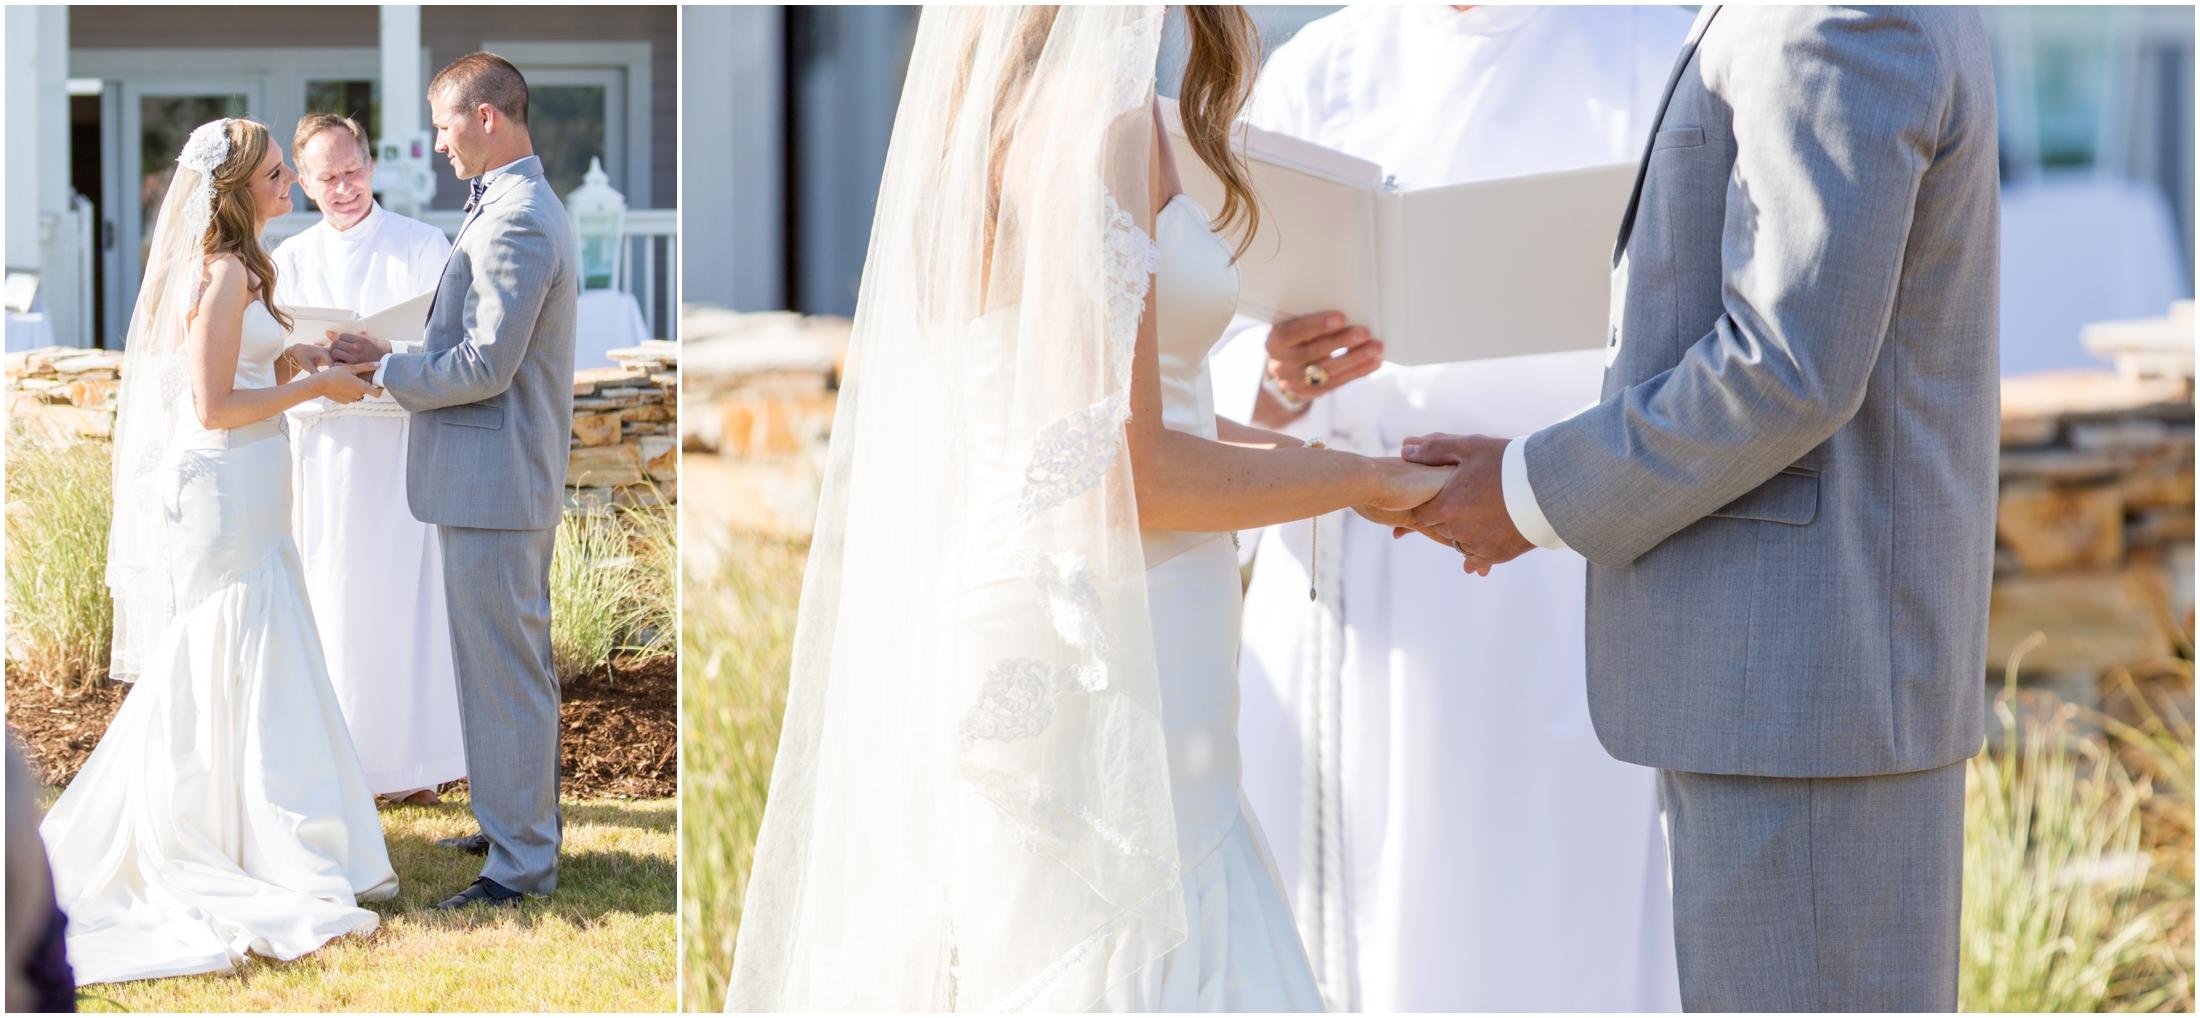 Pearce-Wedding-Ceremony-465.jpg